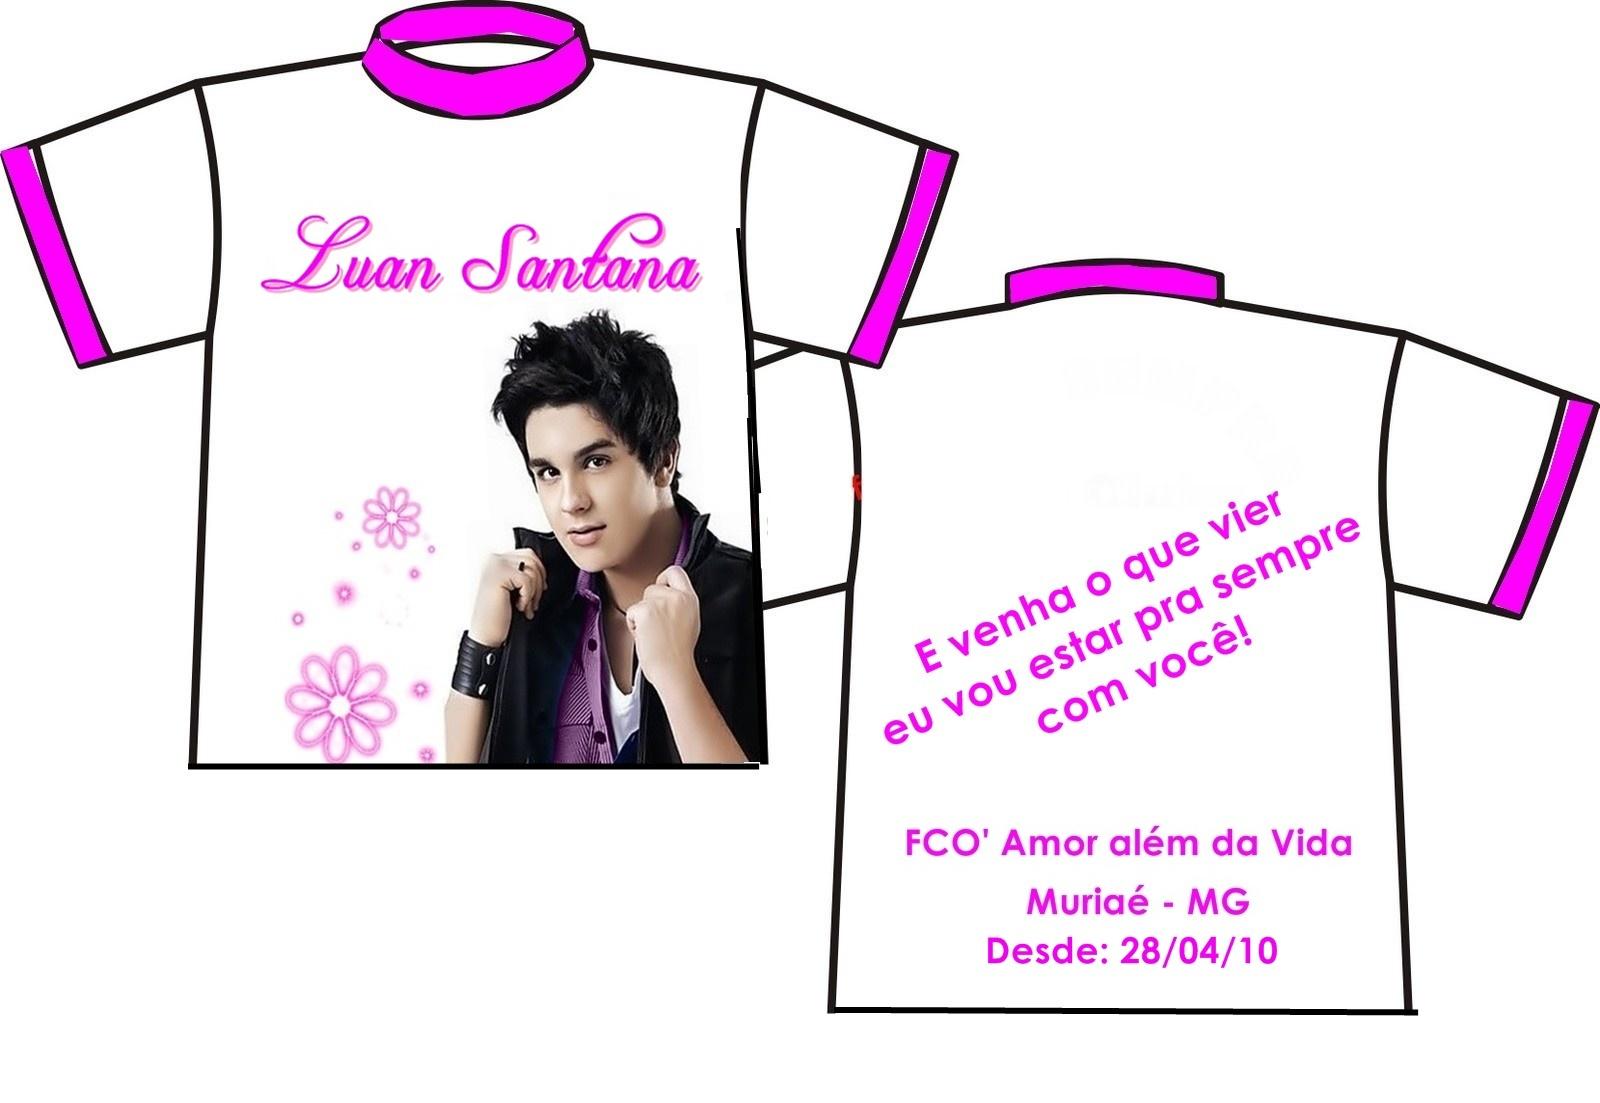 9f6d0da5a2 Luan Santana ♥. Camisa do FCO